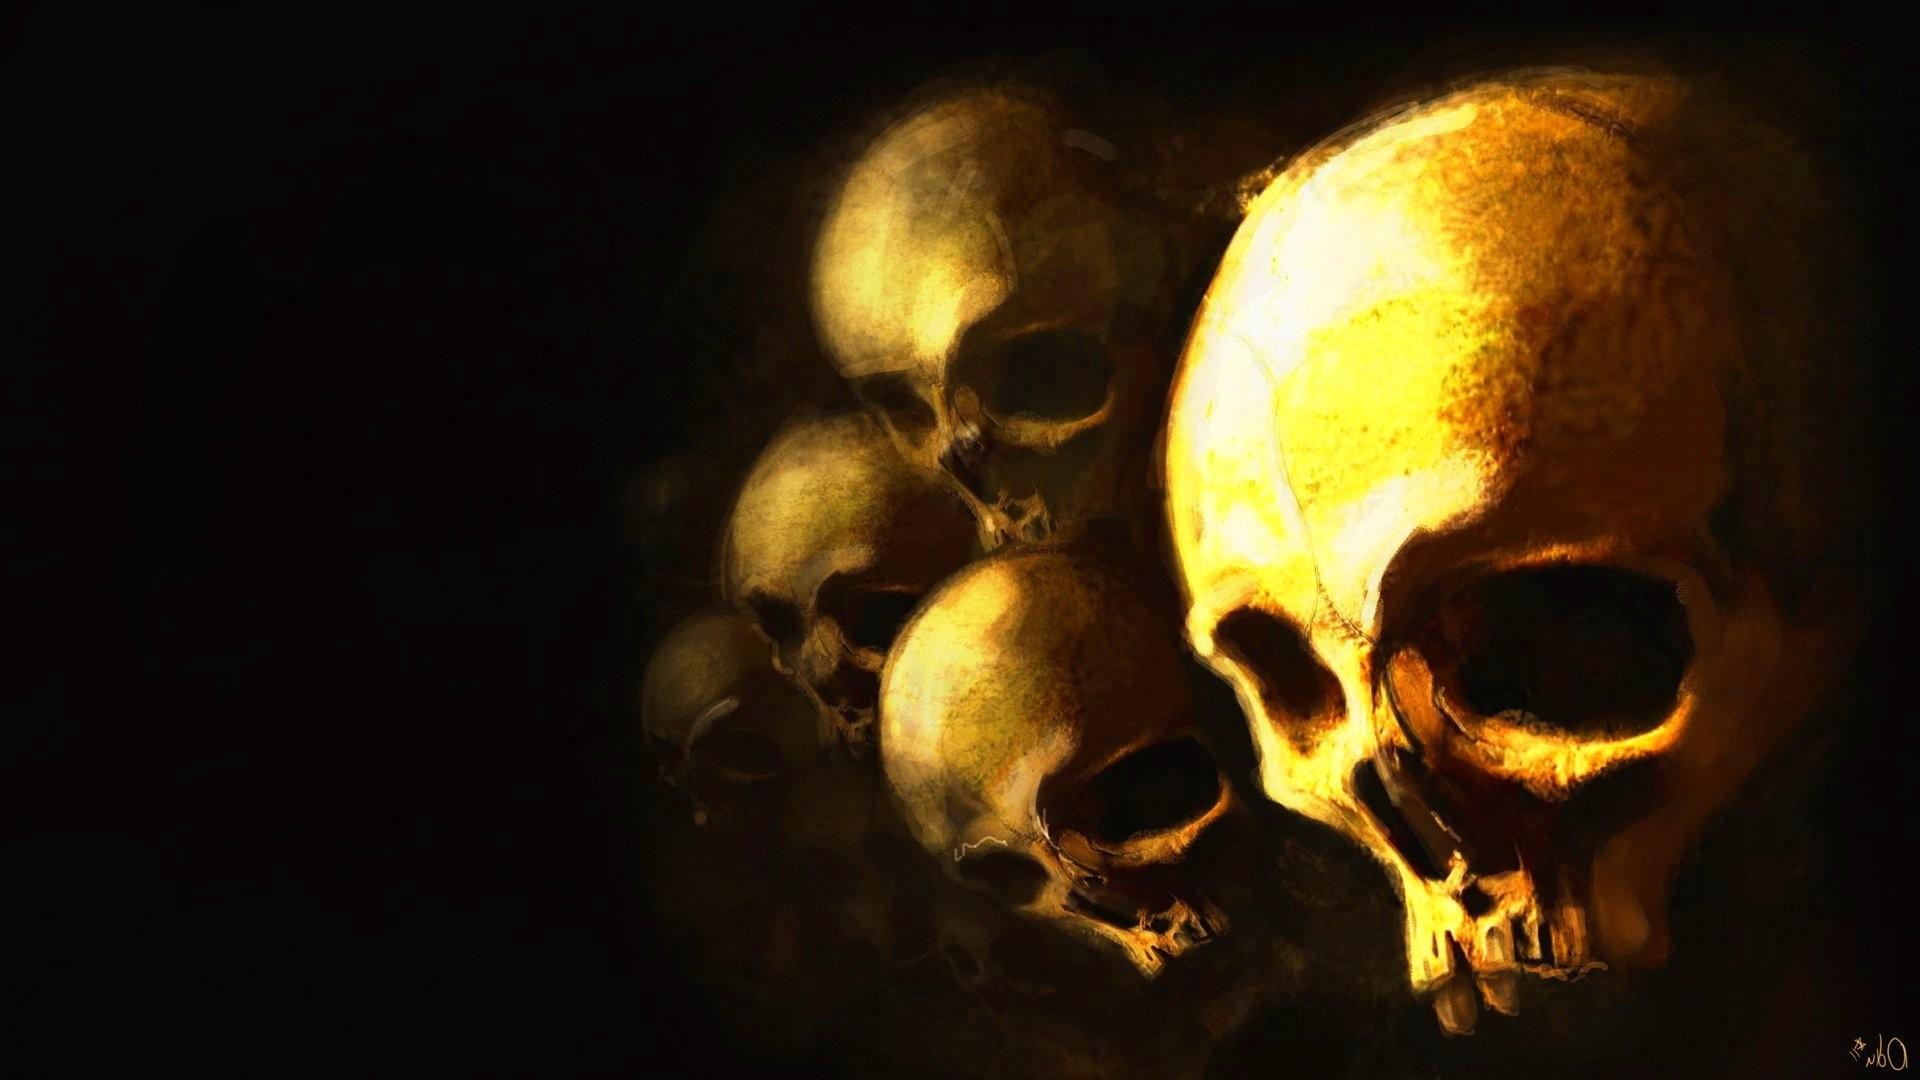 Art,dark, Halloween, Artistic, Artwork, Original, Aesthetic, - Still Life Photography - HD Wallpaper